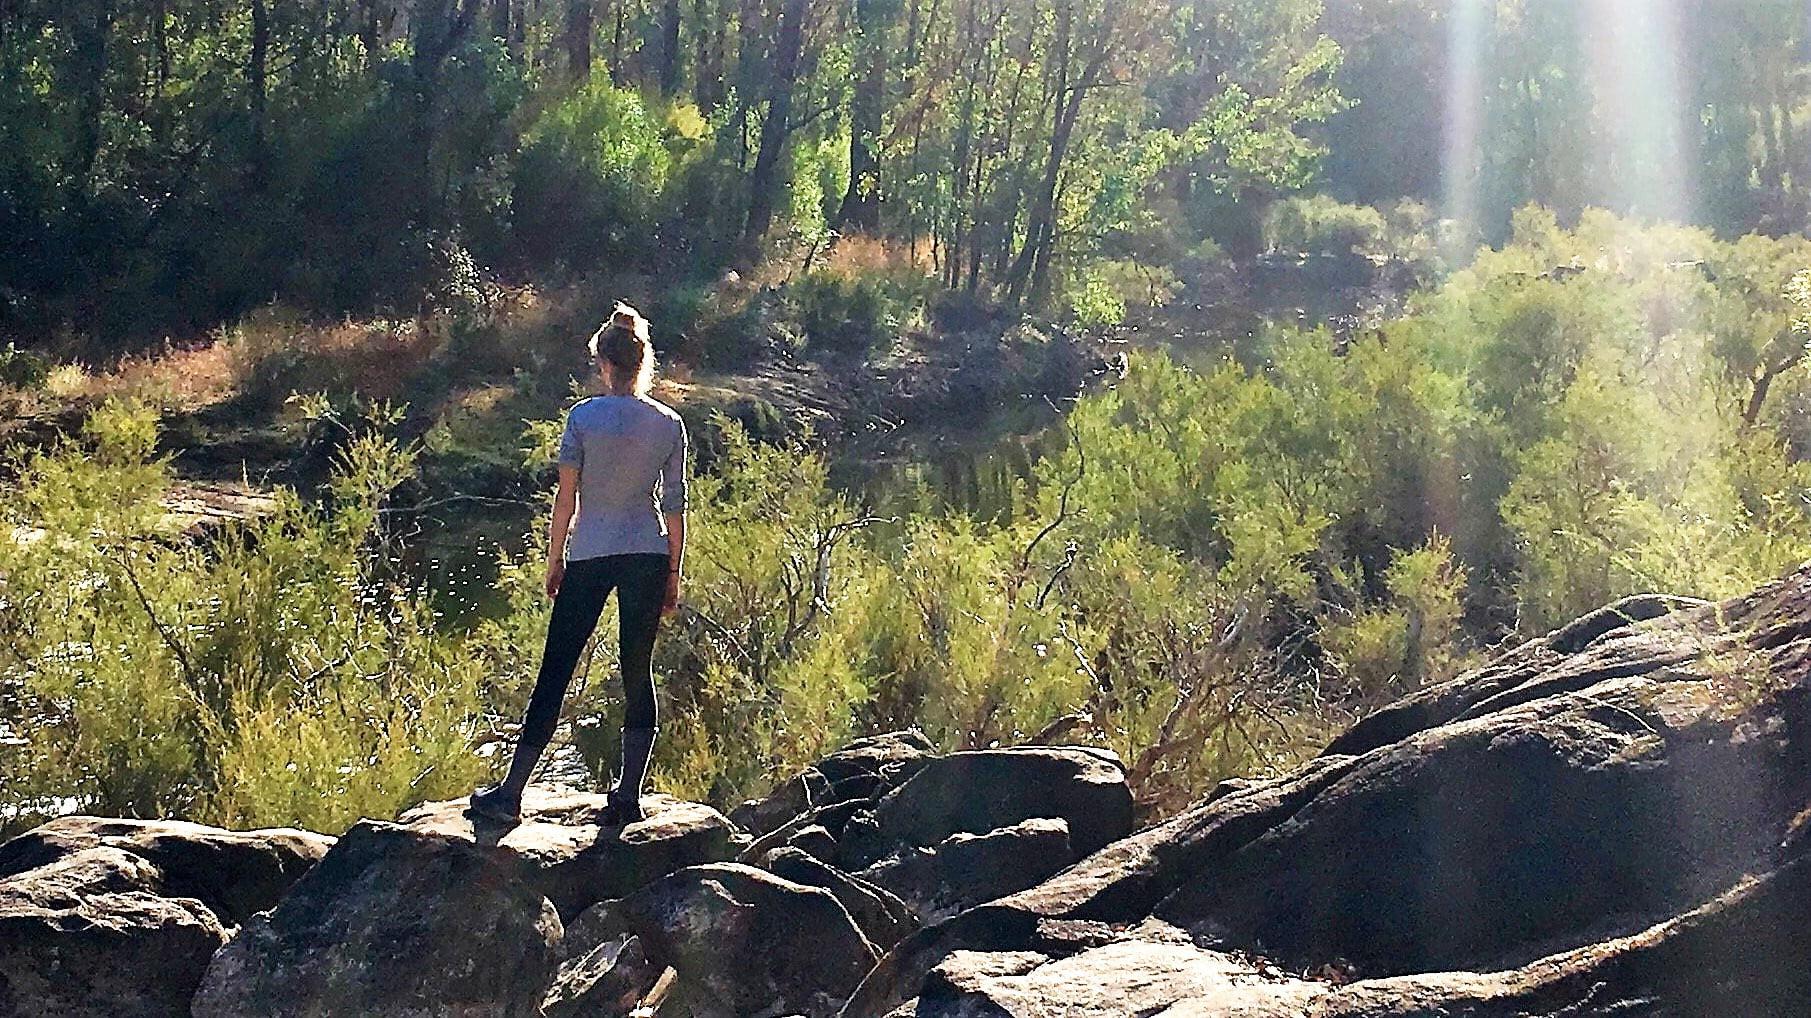 Sarah on the Bibbulmun Track enjoying the silence